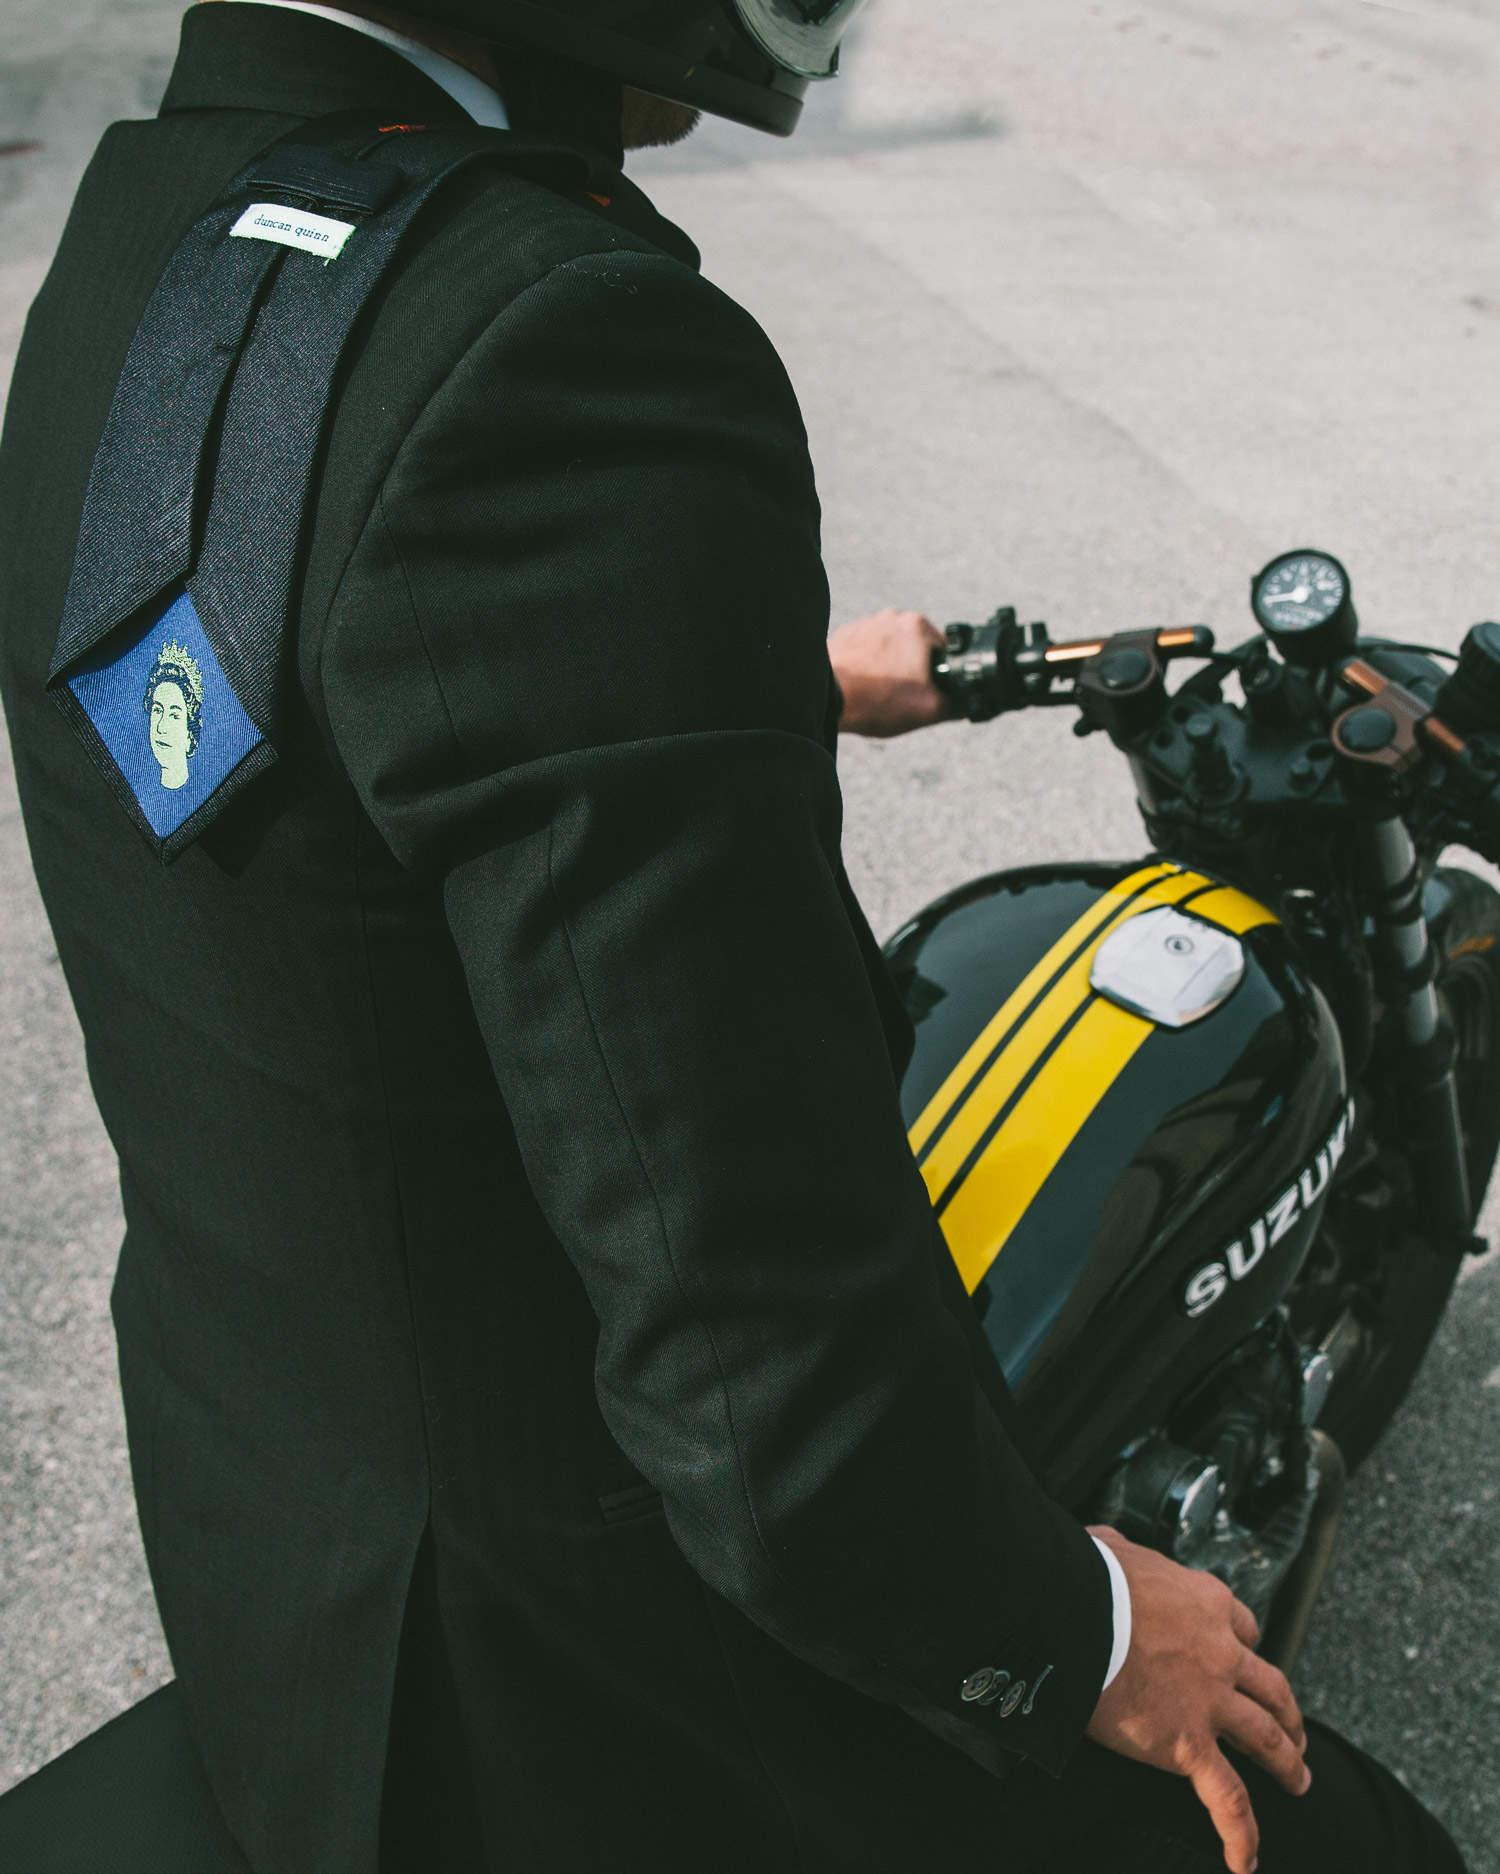 the-suited-racer-SMF-left.jpg